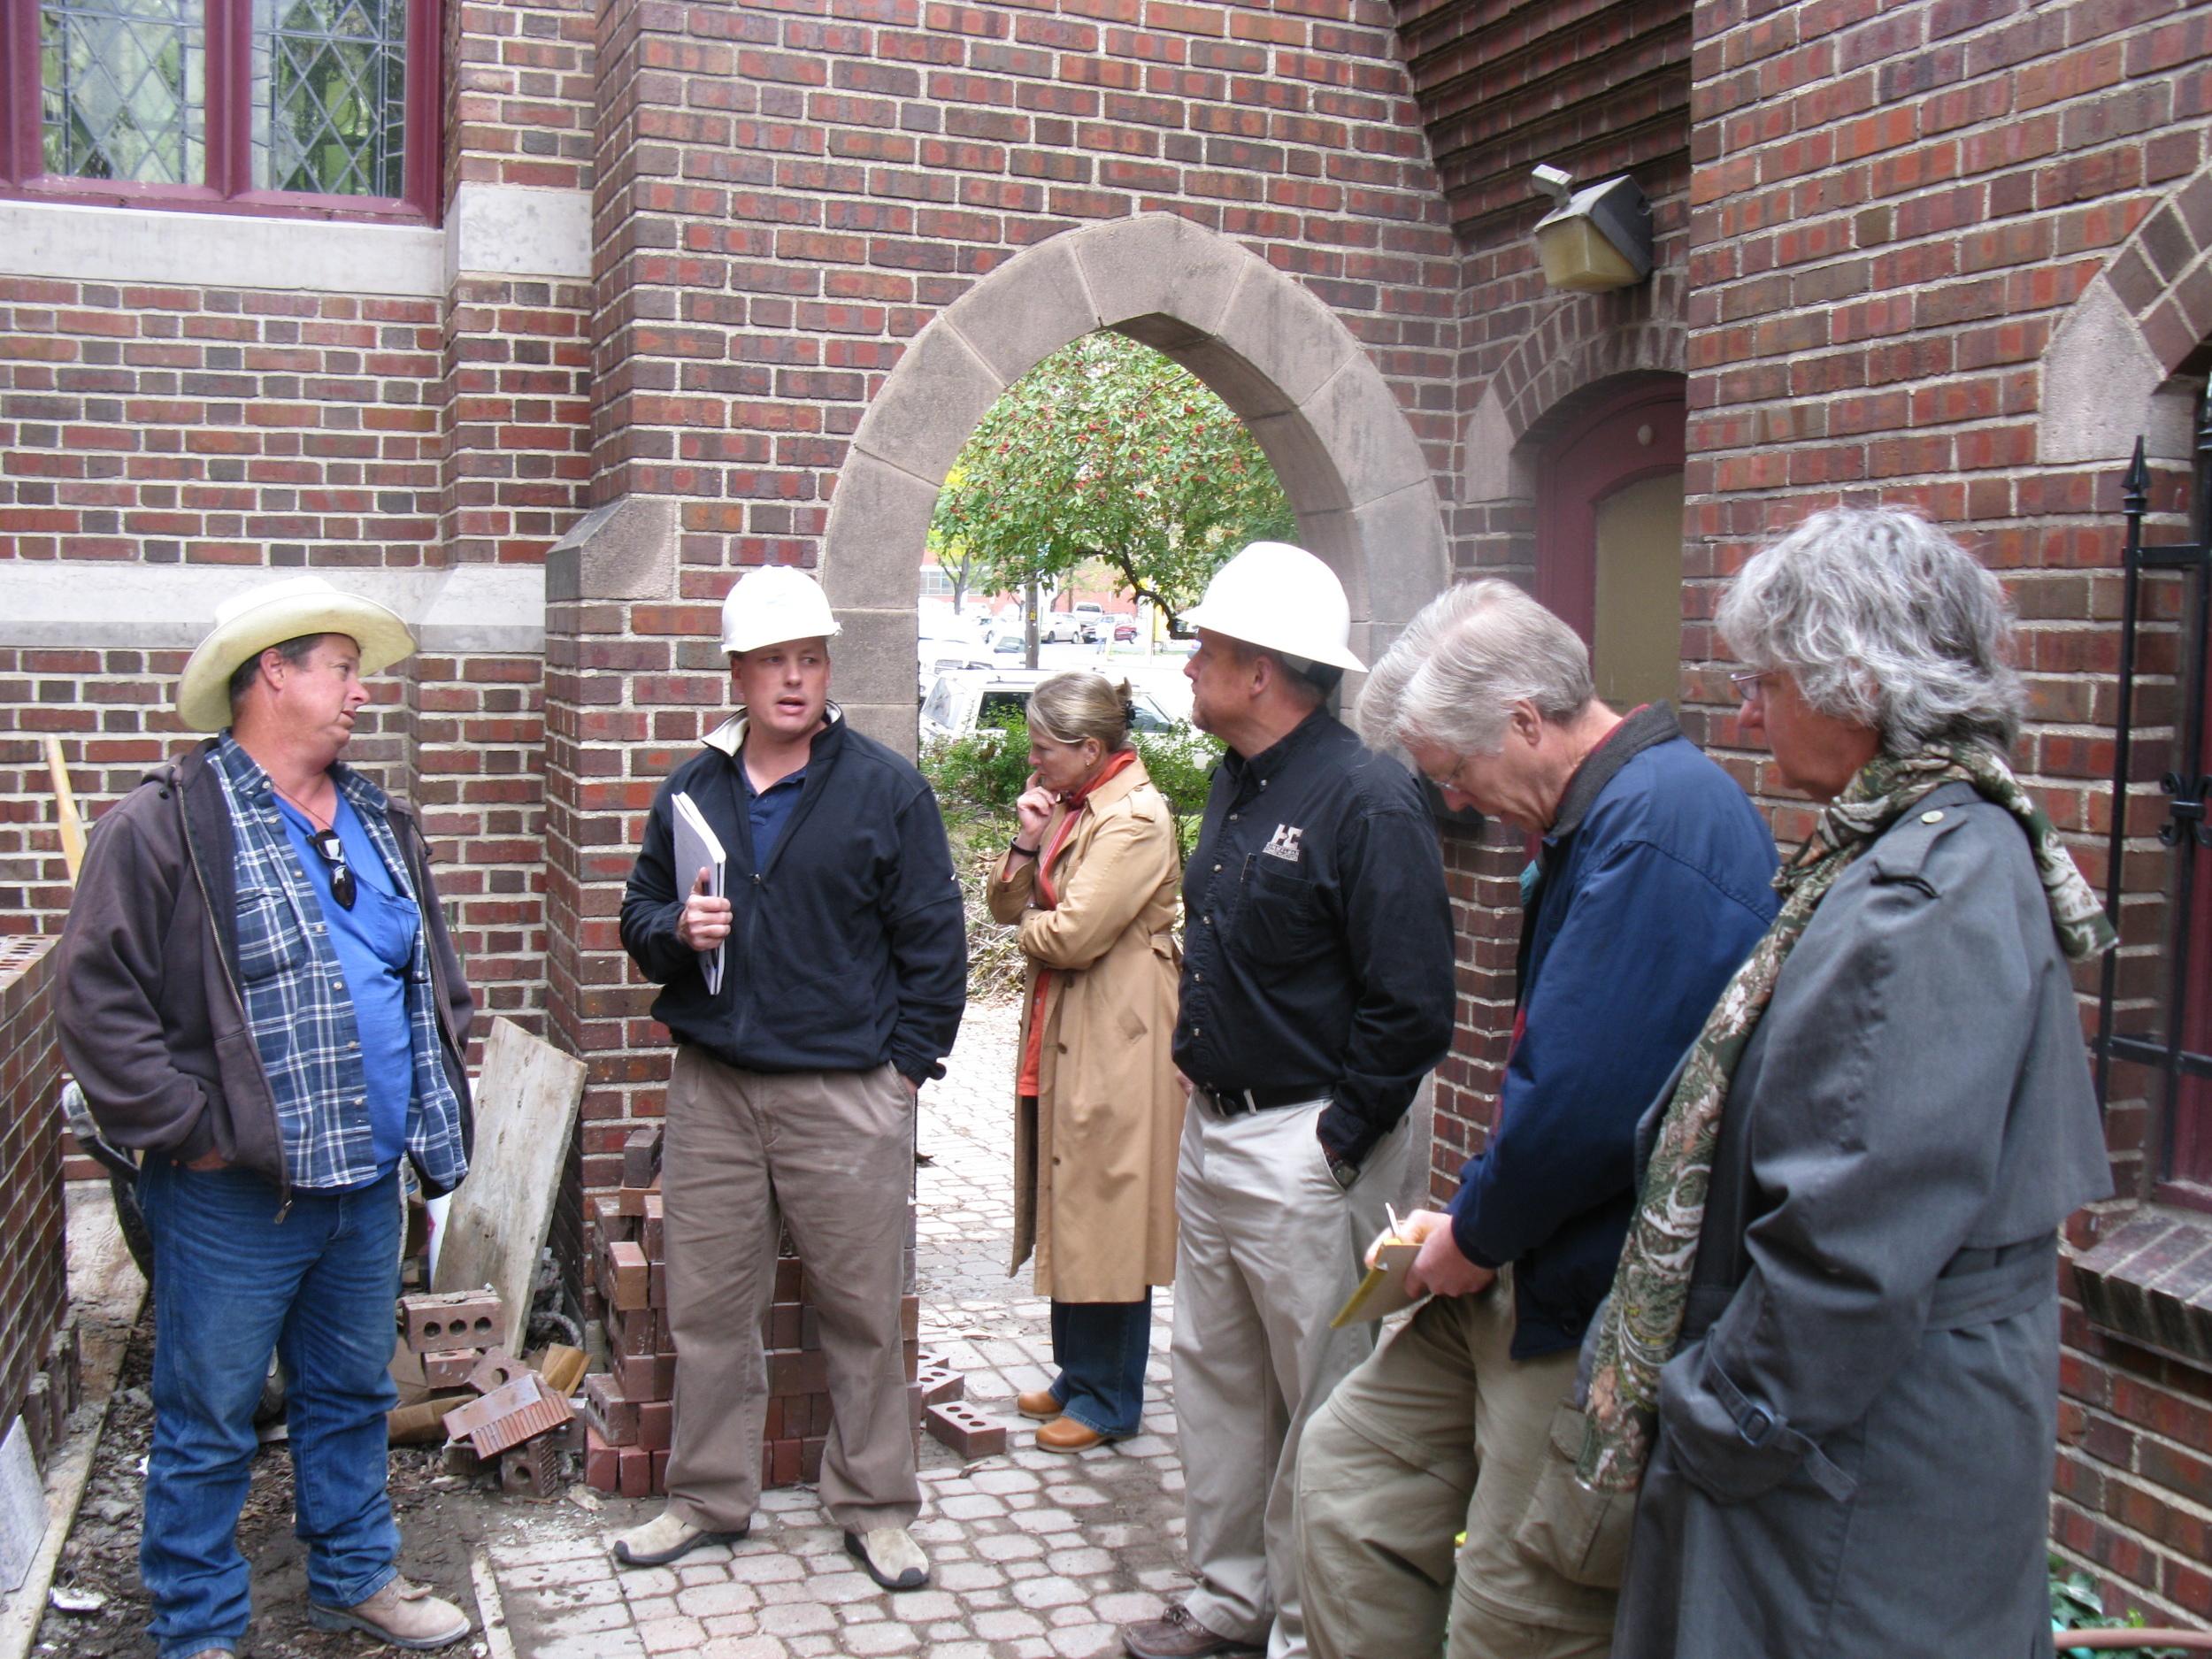 Selecting the brick